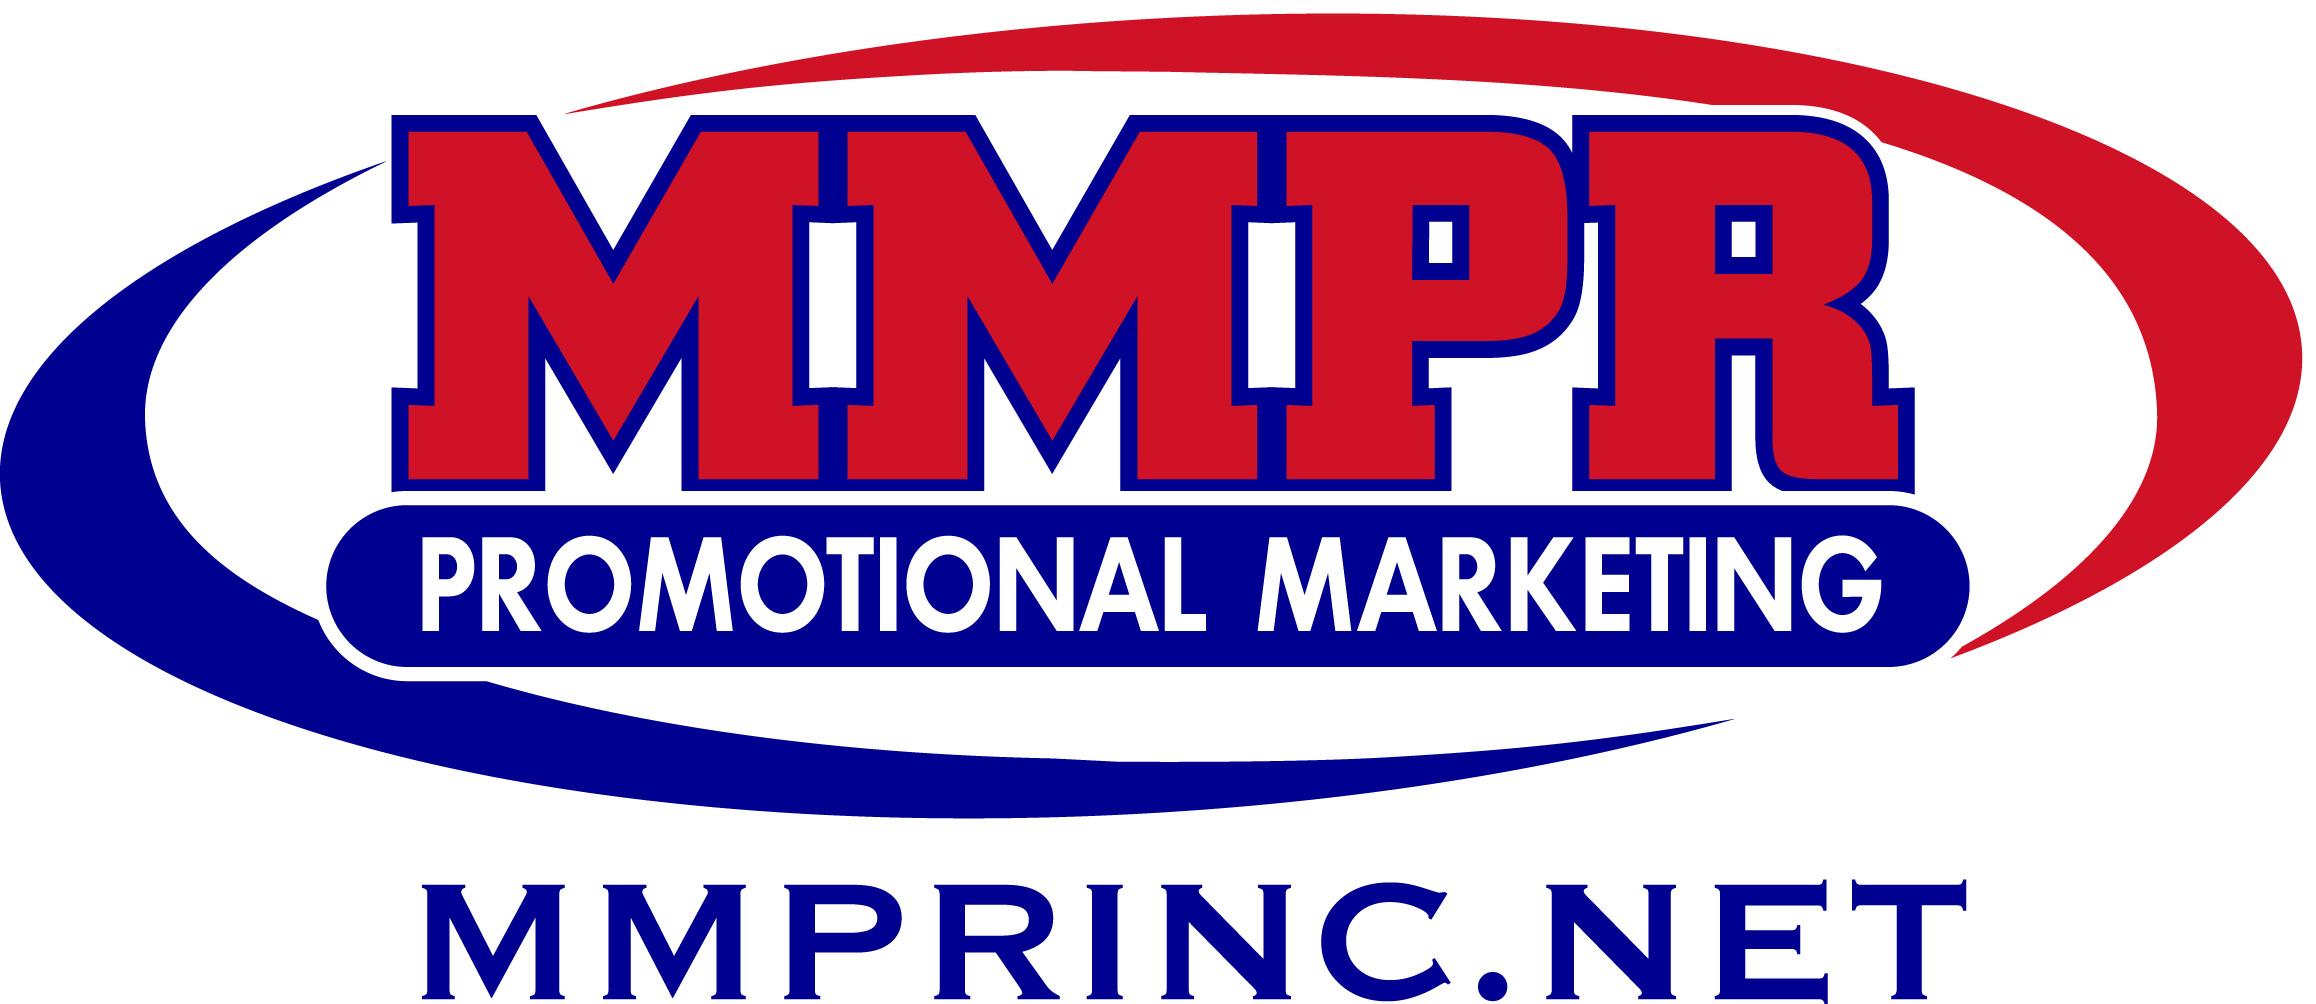 http://rhymebiz.com/sites/rhymebiz.com/assets/images/GolfOuting/MMPR_Logo.jpg